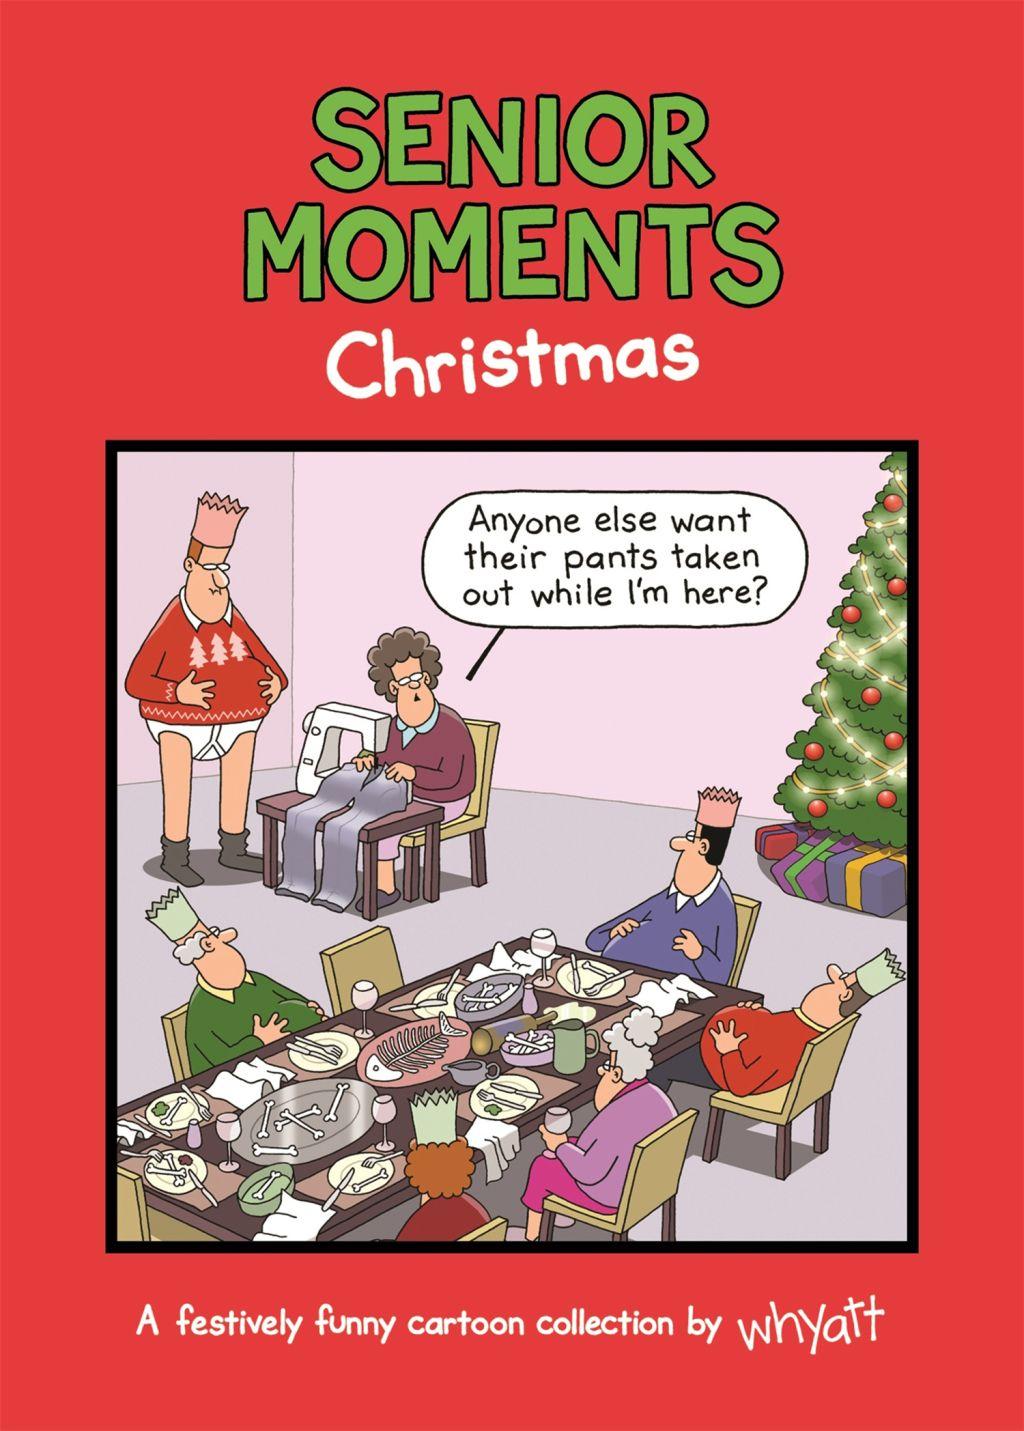 Senior Moments Christmas (eBook) Christmas humor, In